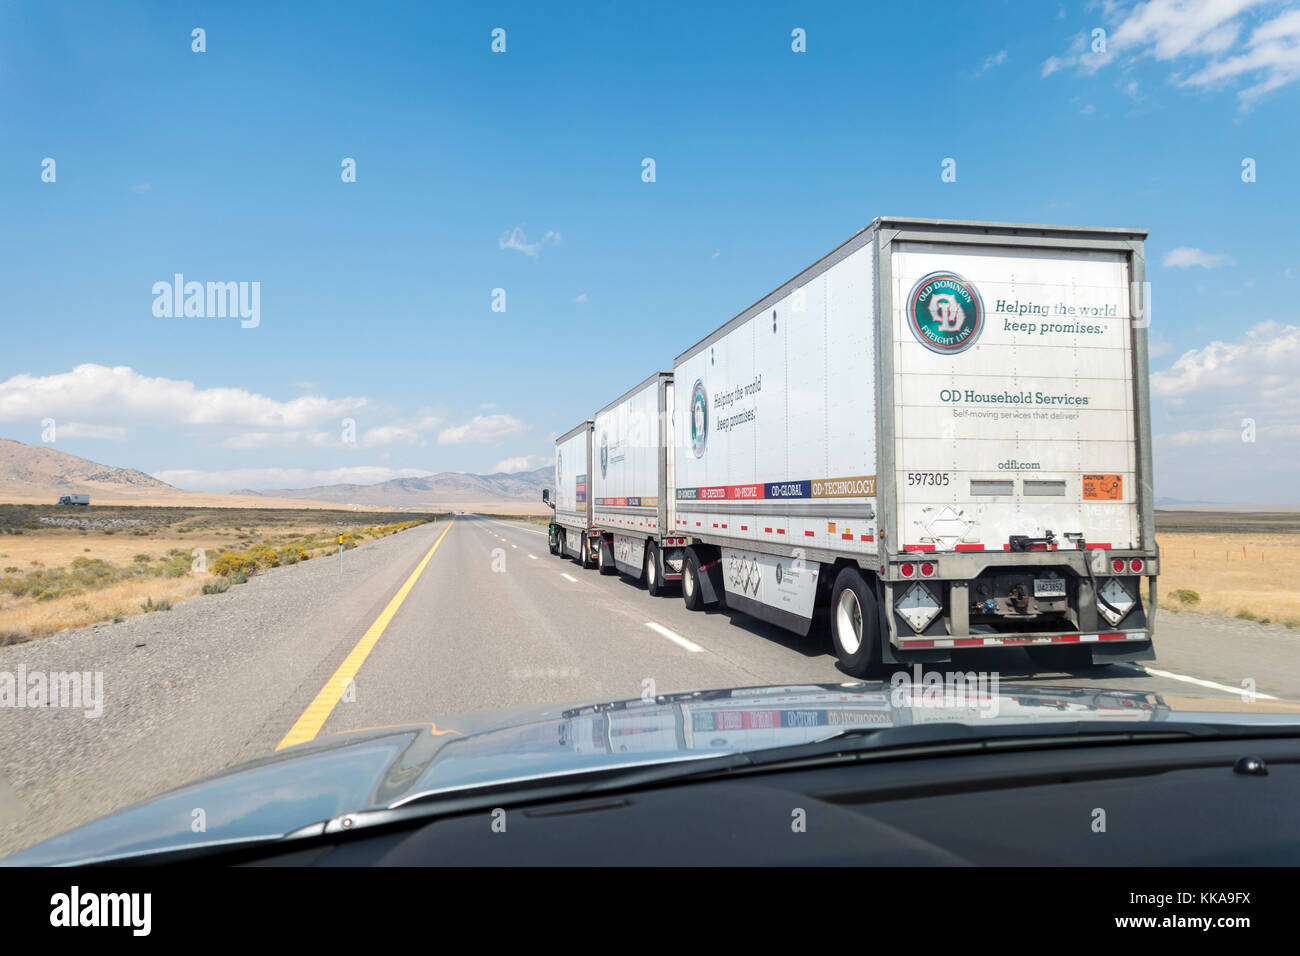 https://c7.alamy.com/comp/KKA9FX/old-dominion-freight-line-triple-trailer-combination-road-train-on-KKA9FX.jpg